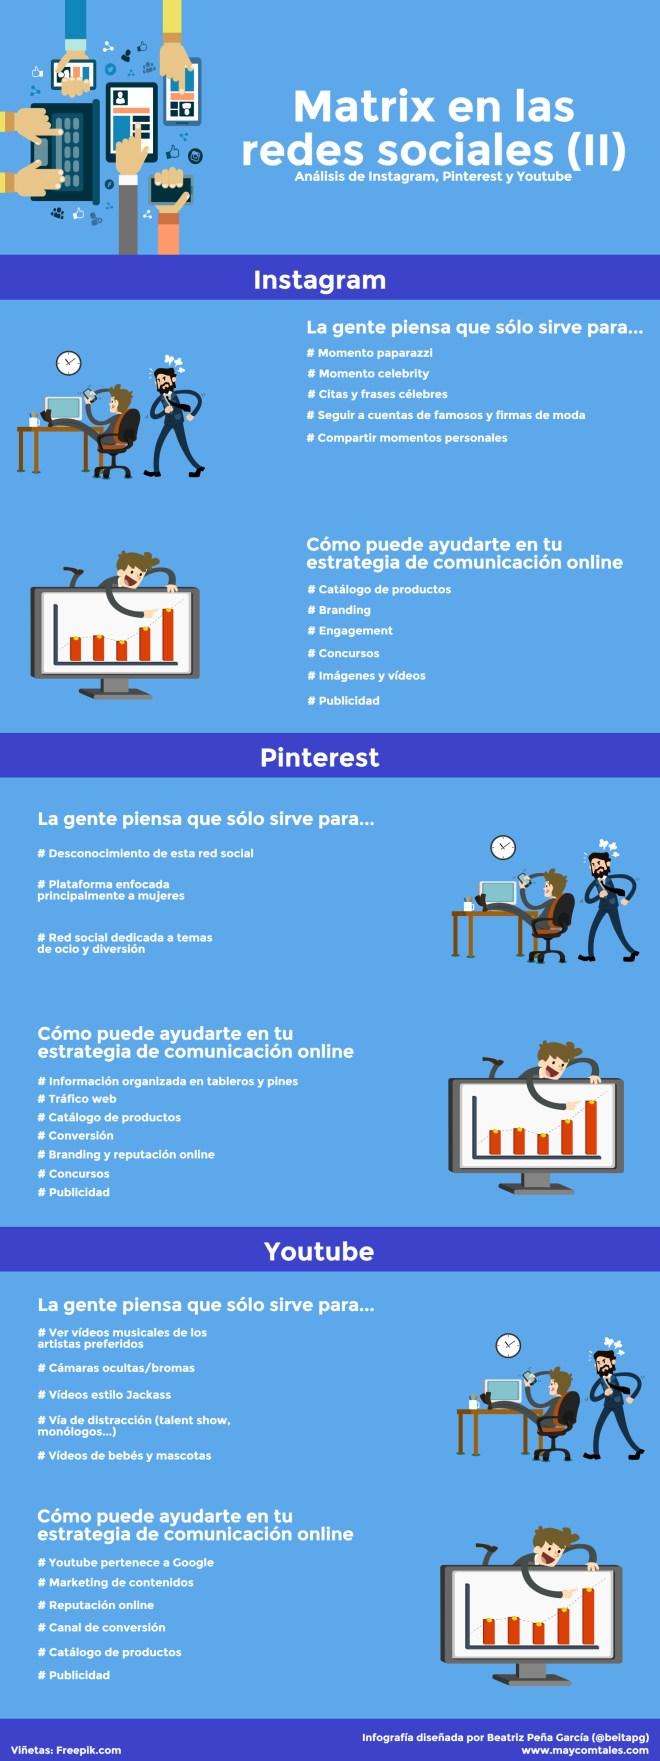 Matrix en las Redes Sociales II (Instagram/Pintererest/YouTube)